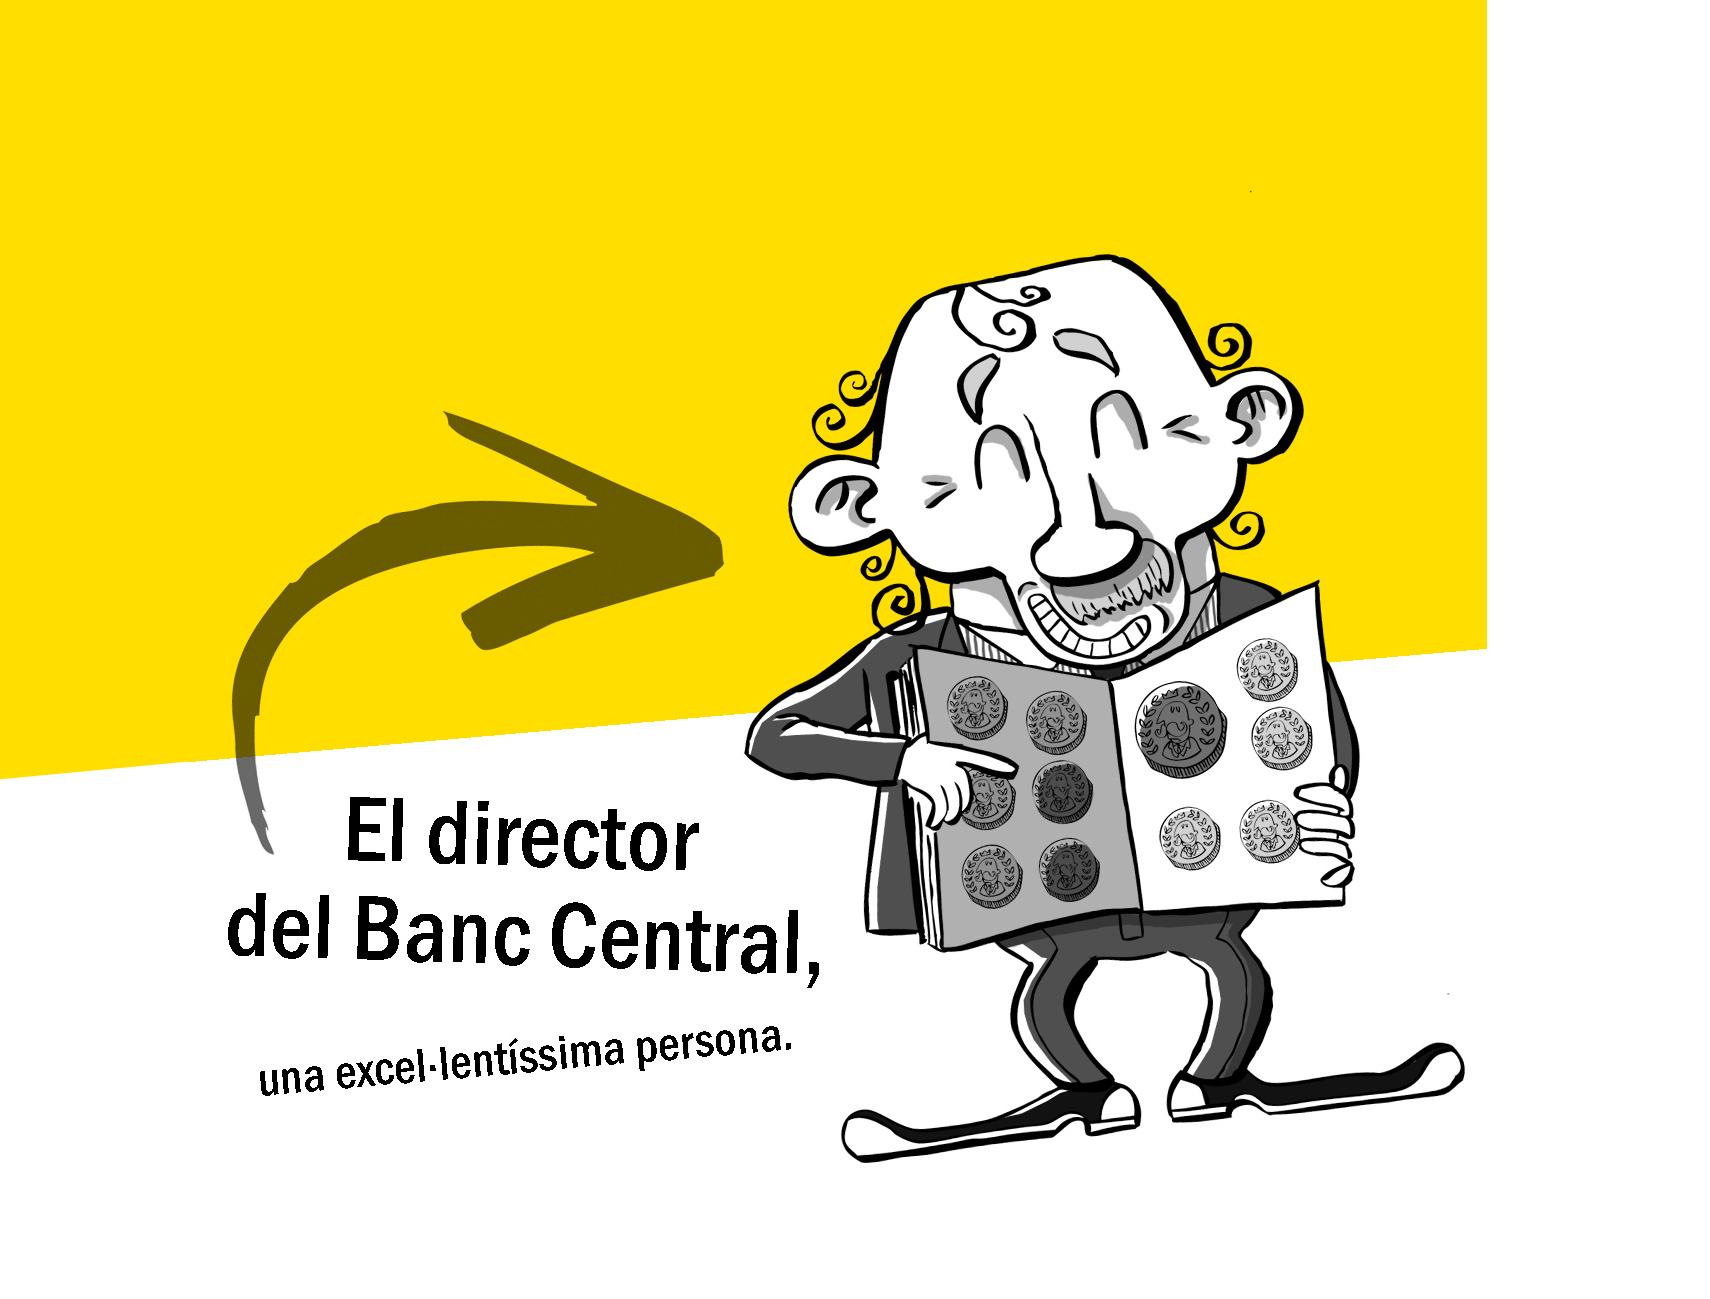 El director del Banc Central